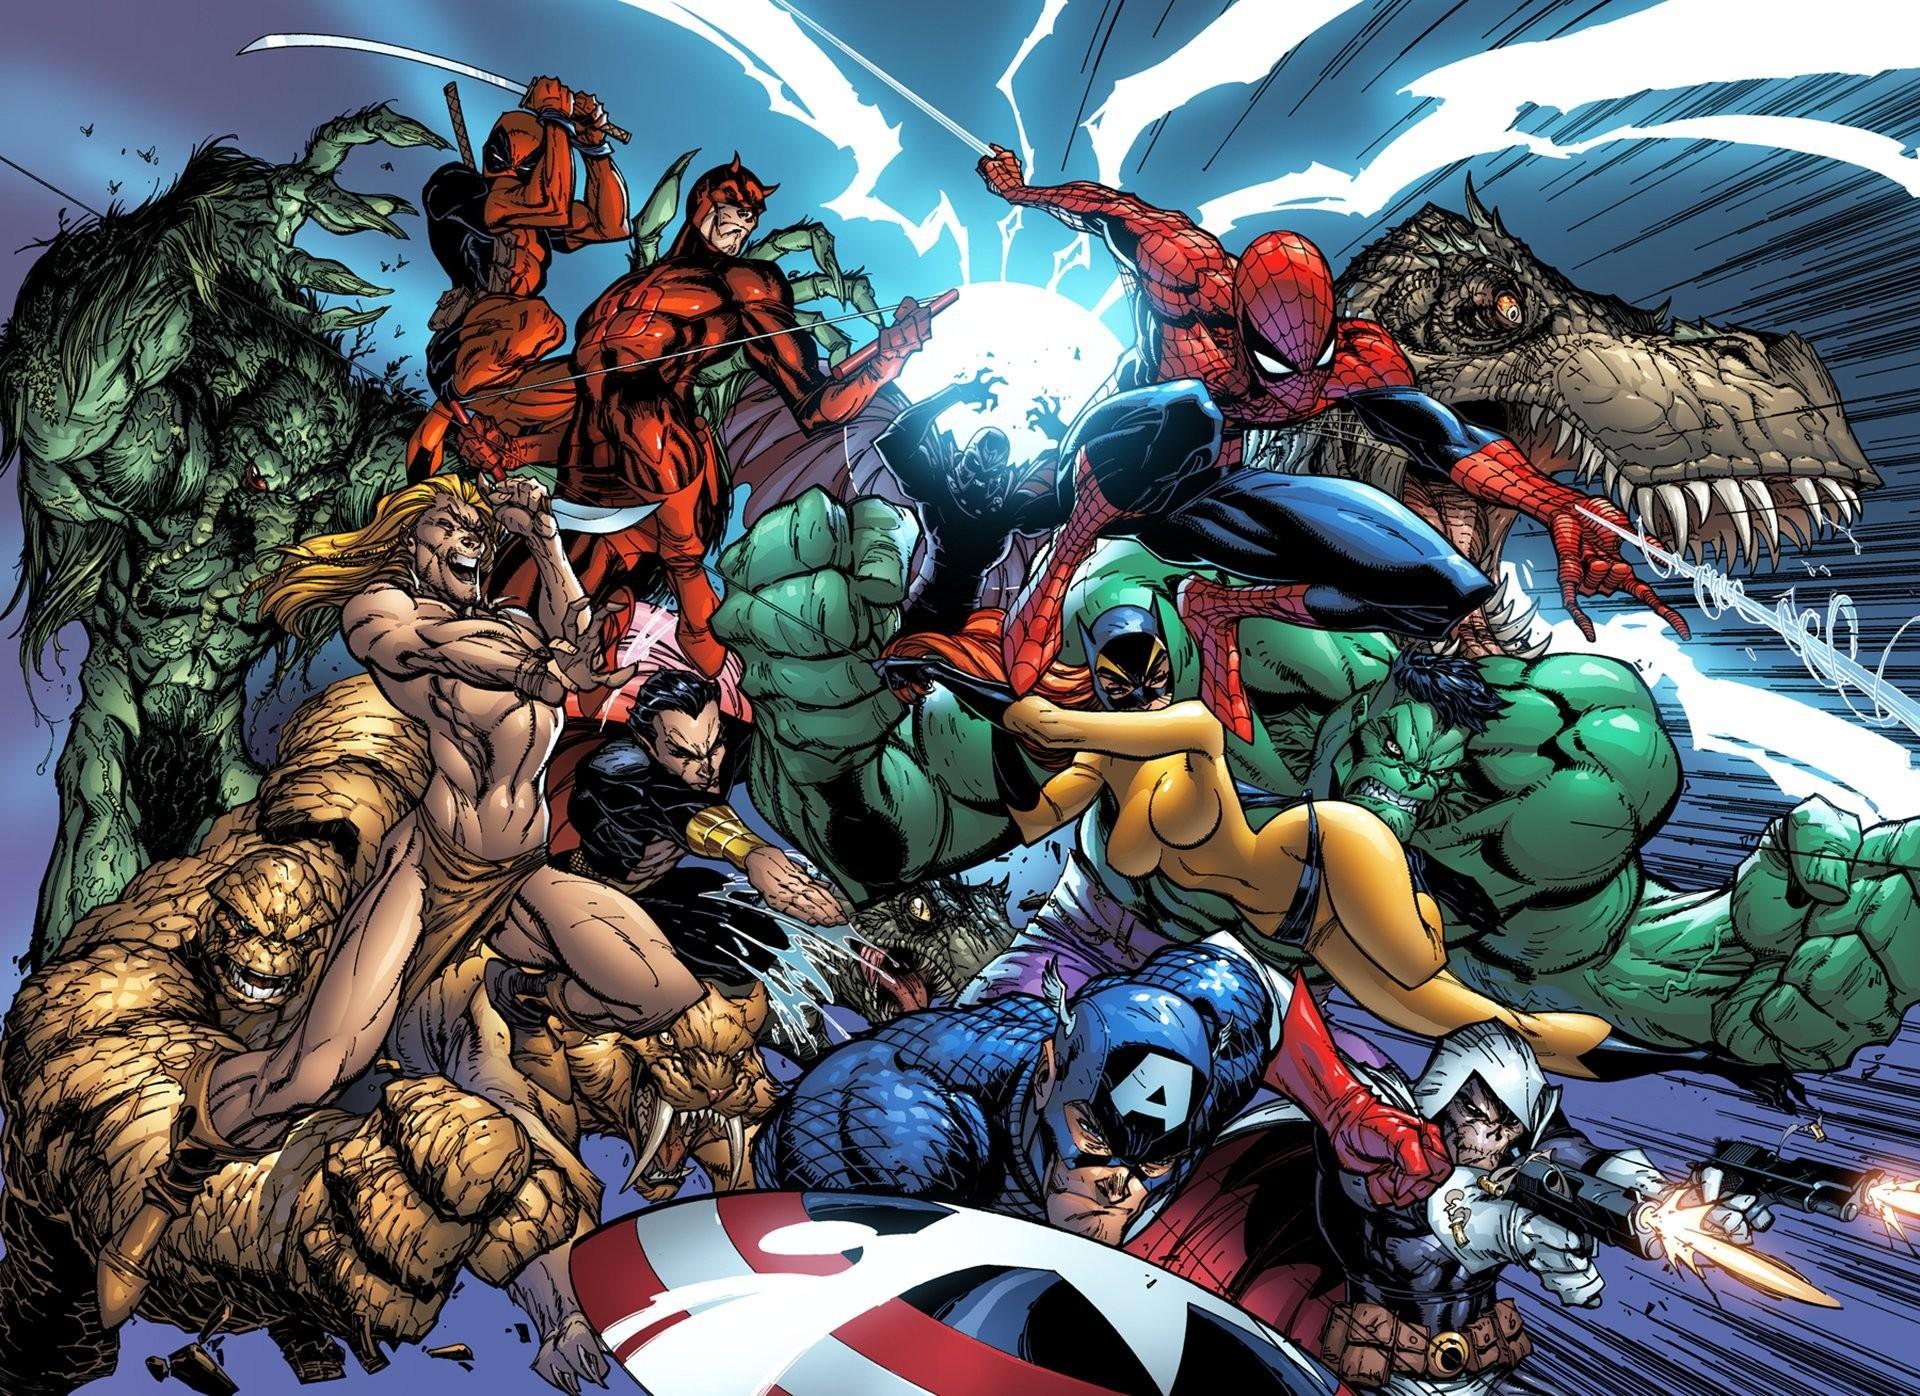 spider-man peter parker marvel comics captain america steven rogers hulk  bruce banner deadpool wade